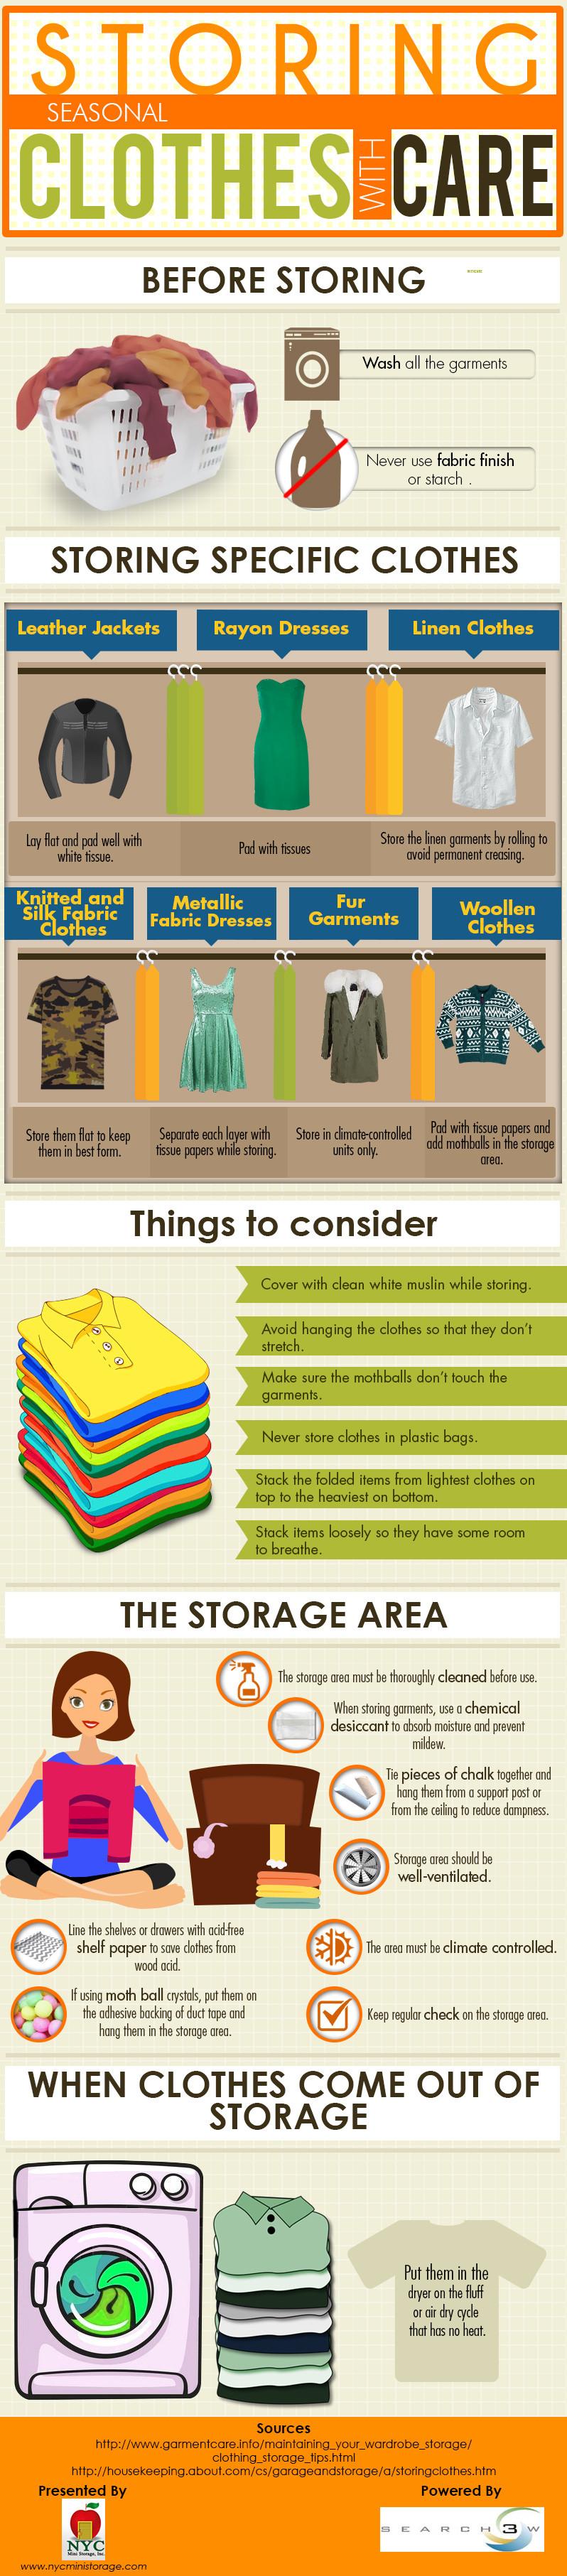 como-almacenar-ropa-estaciones-infografia